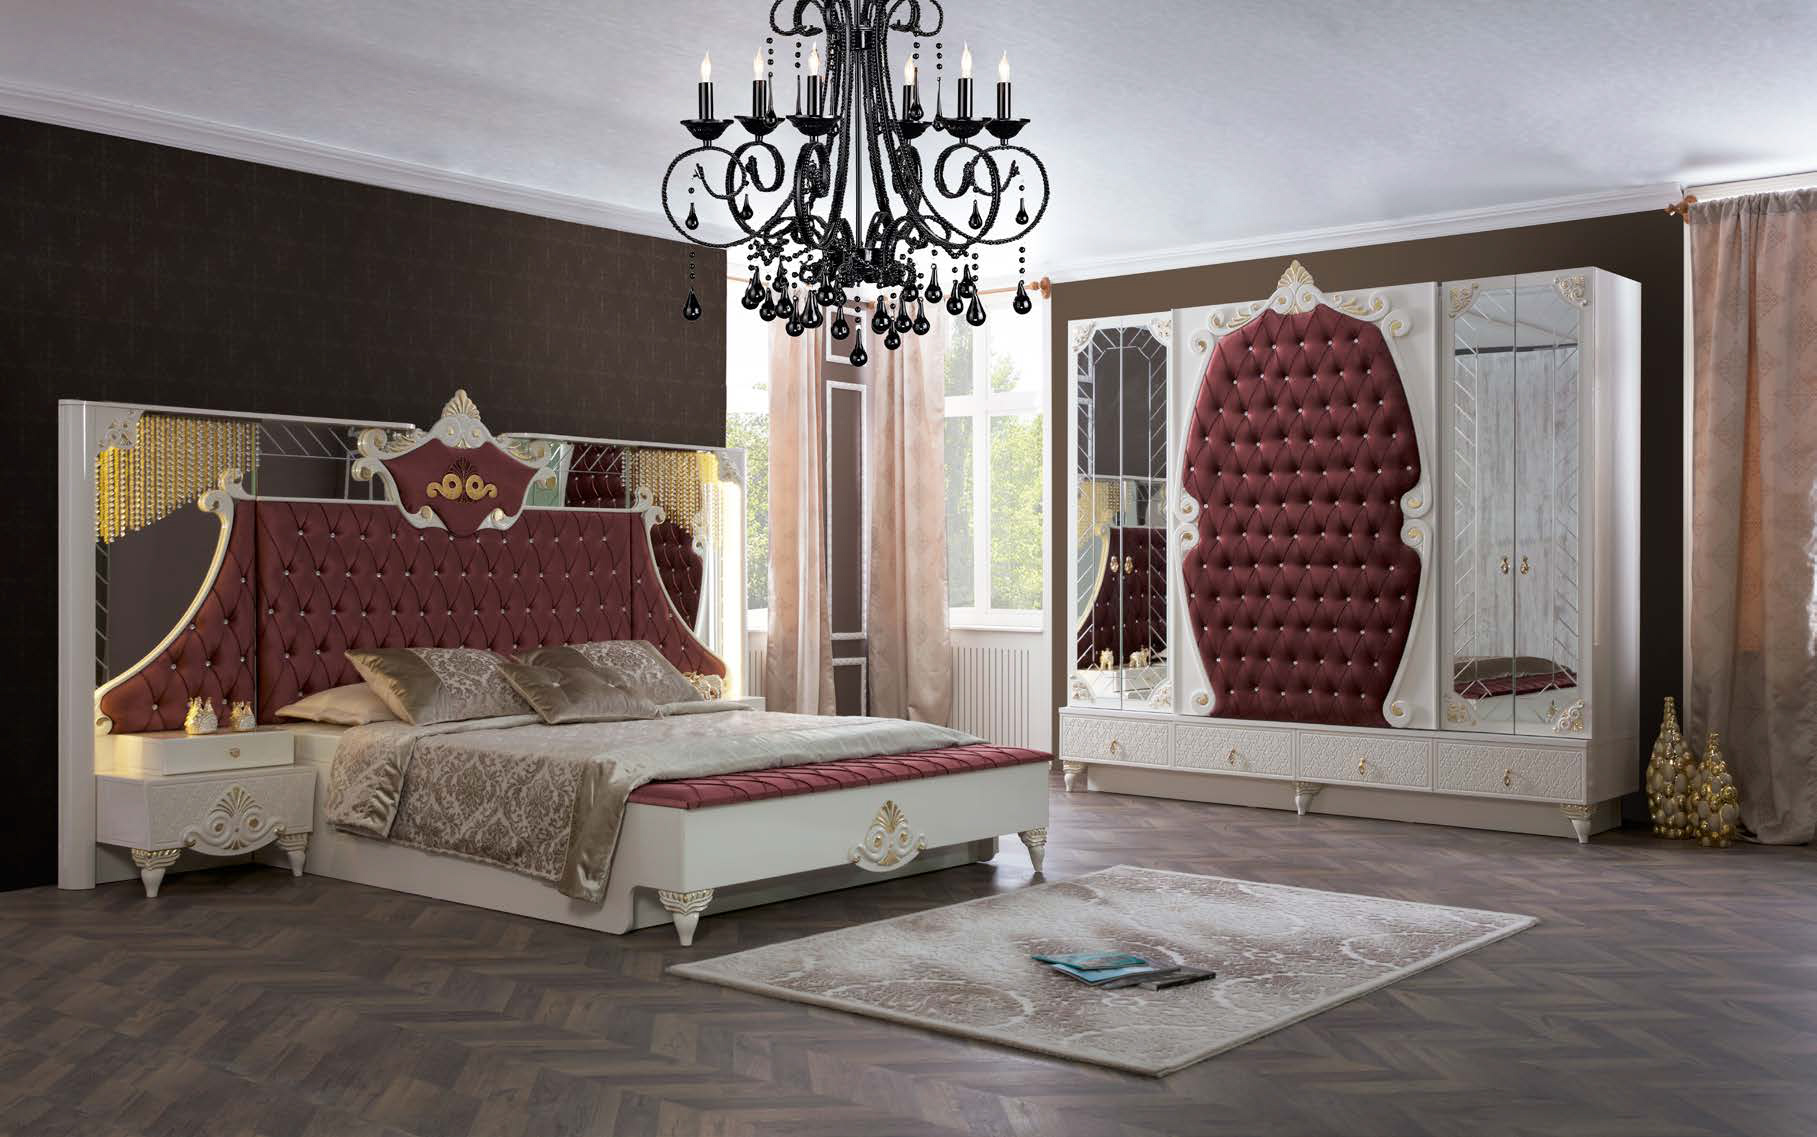 mbelhaus frankfurt finest mbelhaus frankfurt fr und. Black Bedroom Furniture Sets. Home Design Ideas